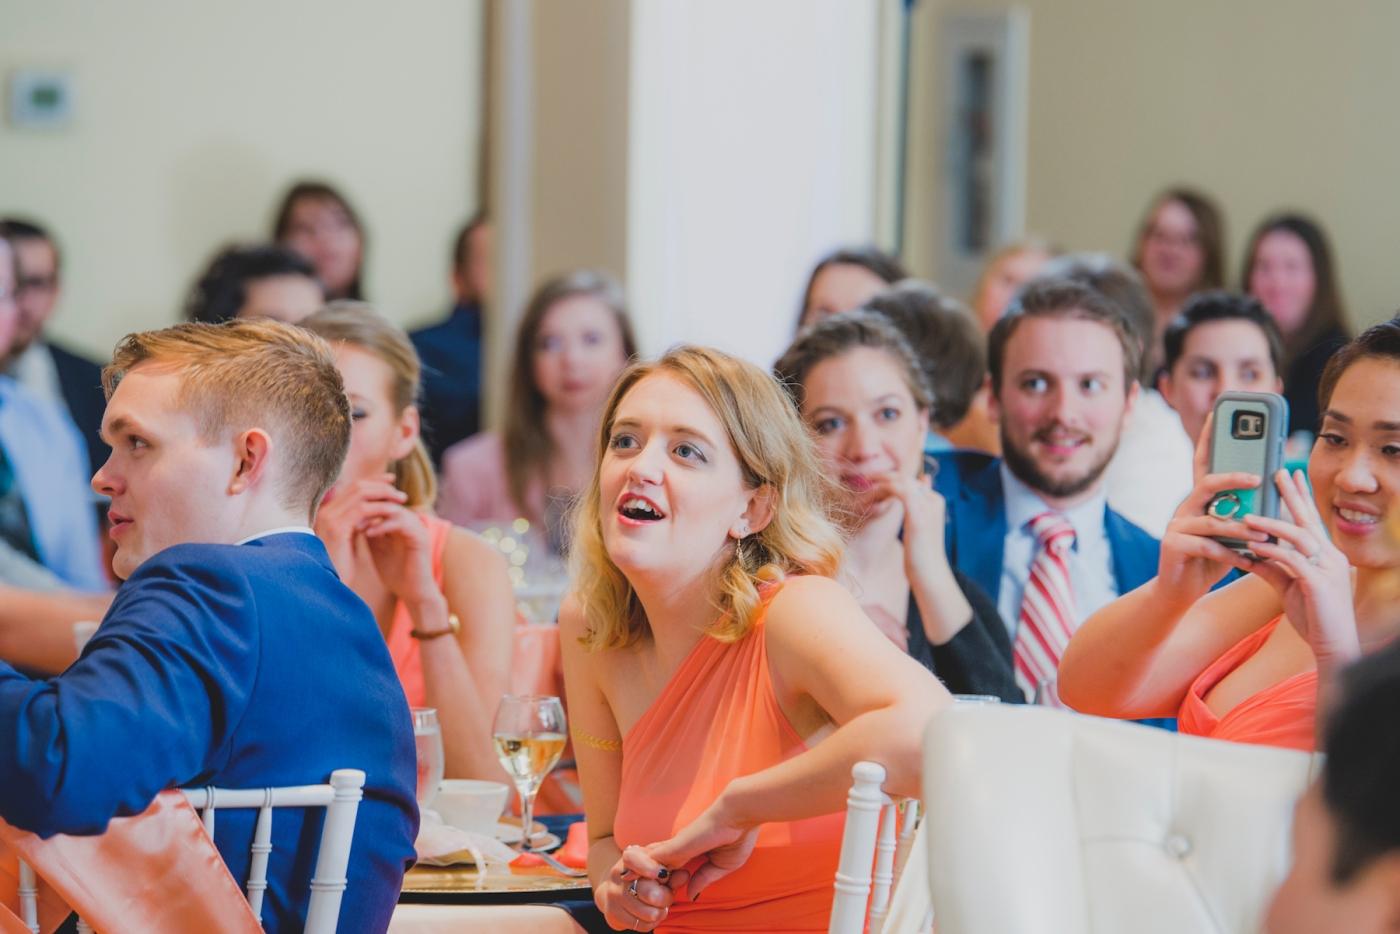 DSC_3231Everett_Wedding_Ballroom_Jane_Speleers_photography_Rachel_and_Edmund_reception_2017